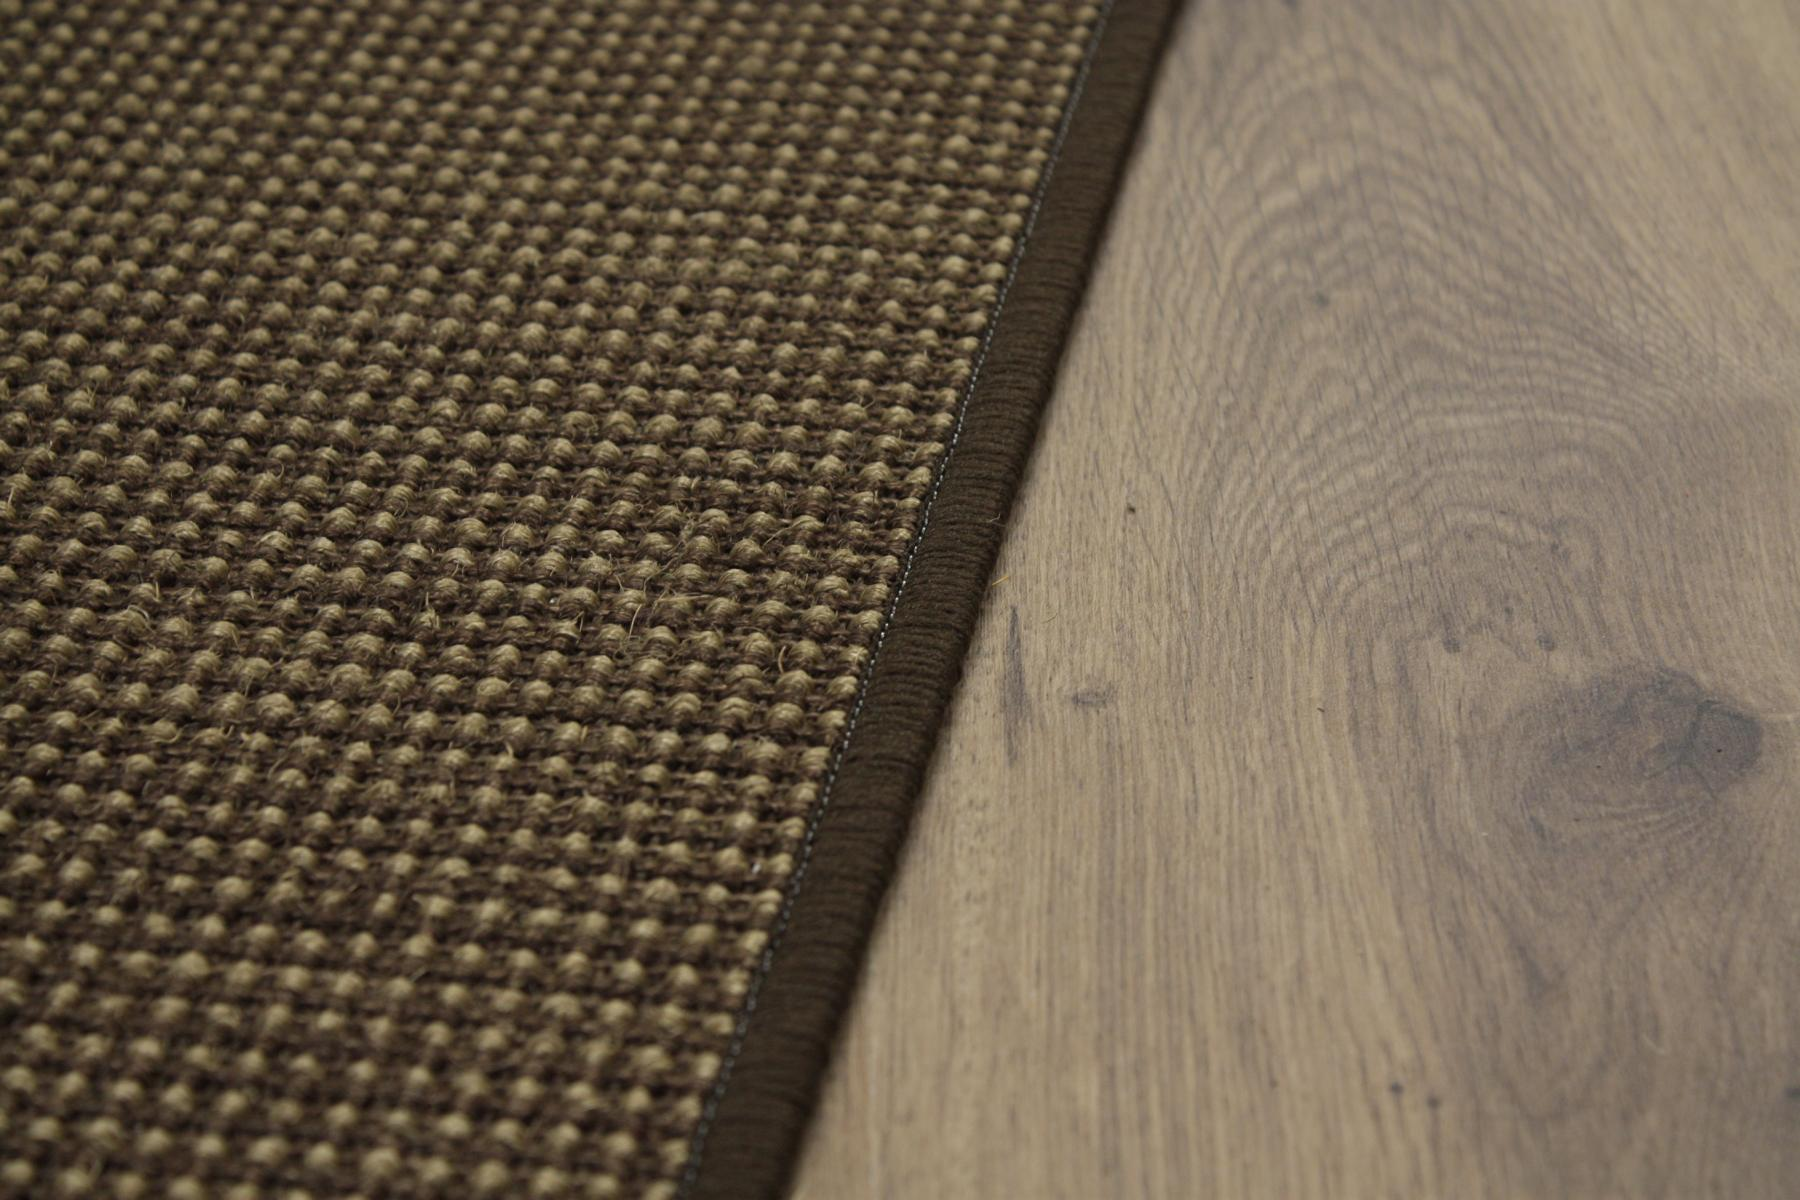 sisal teppich umkettelt gemustert kaffee 100x200cm 100 sisal braun gekettelt ebay. Black Bedroom Furniture Sets. Home Design Ideas